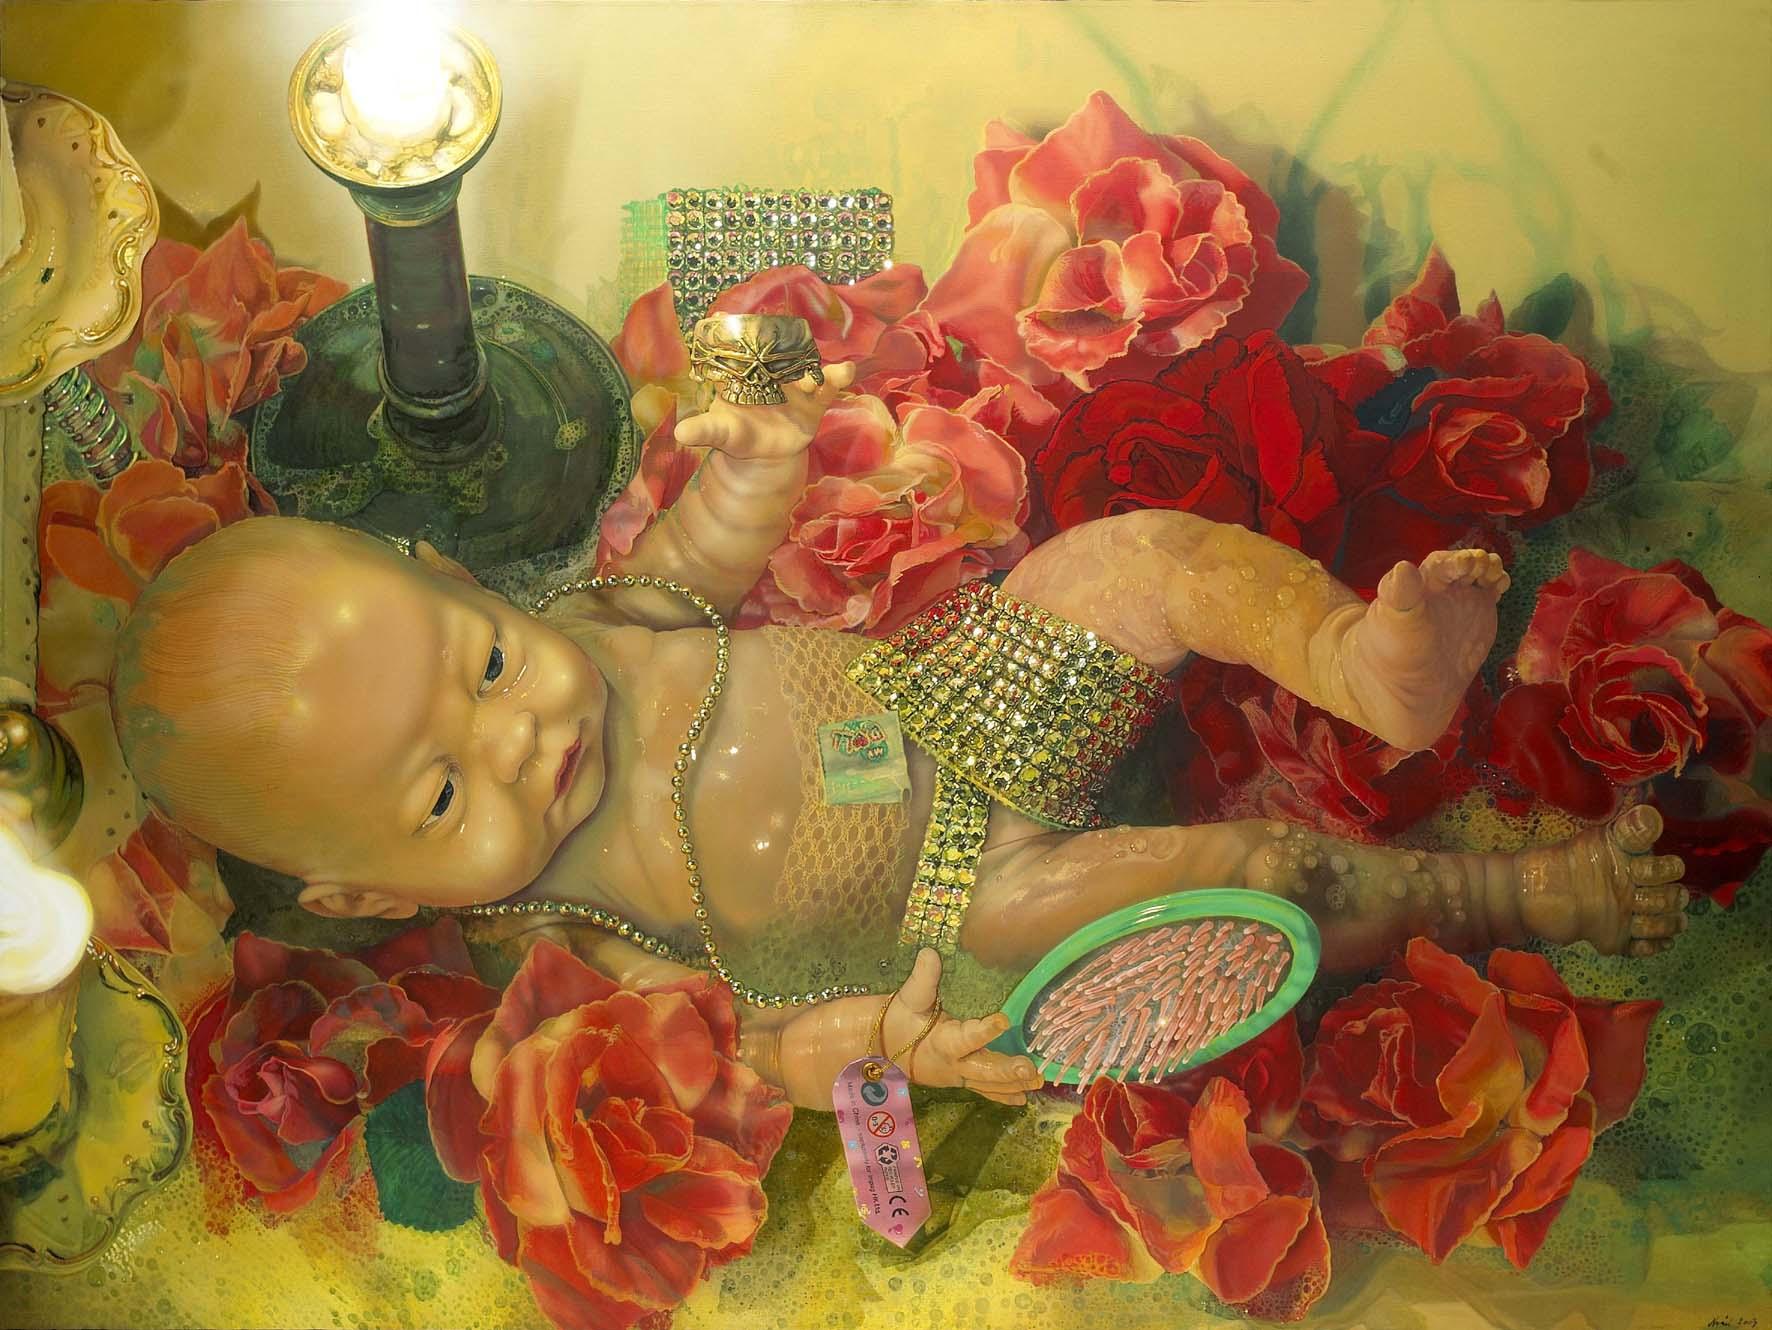 "<p style=""text-align: center;"">Rubber doll – 2003 – 150x200cm – acrylik on canvas</p>"